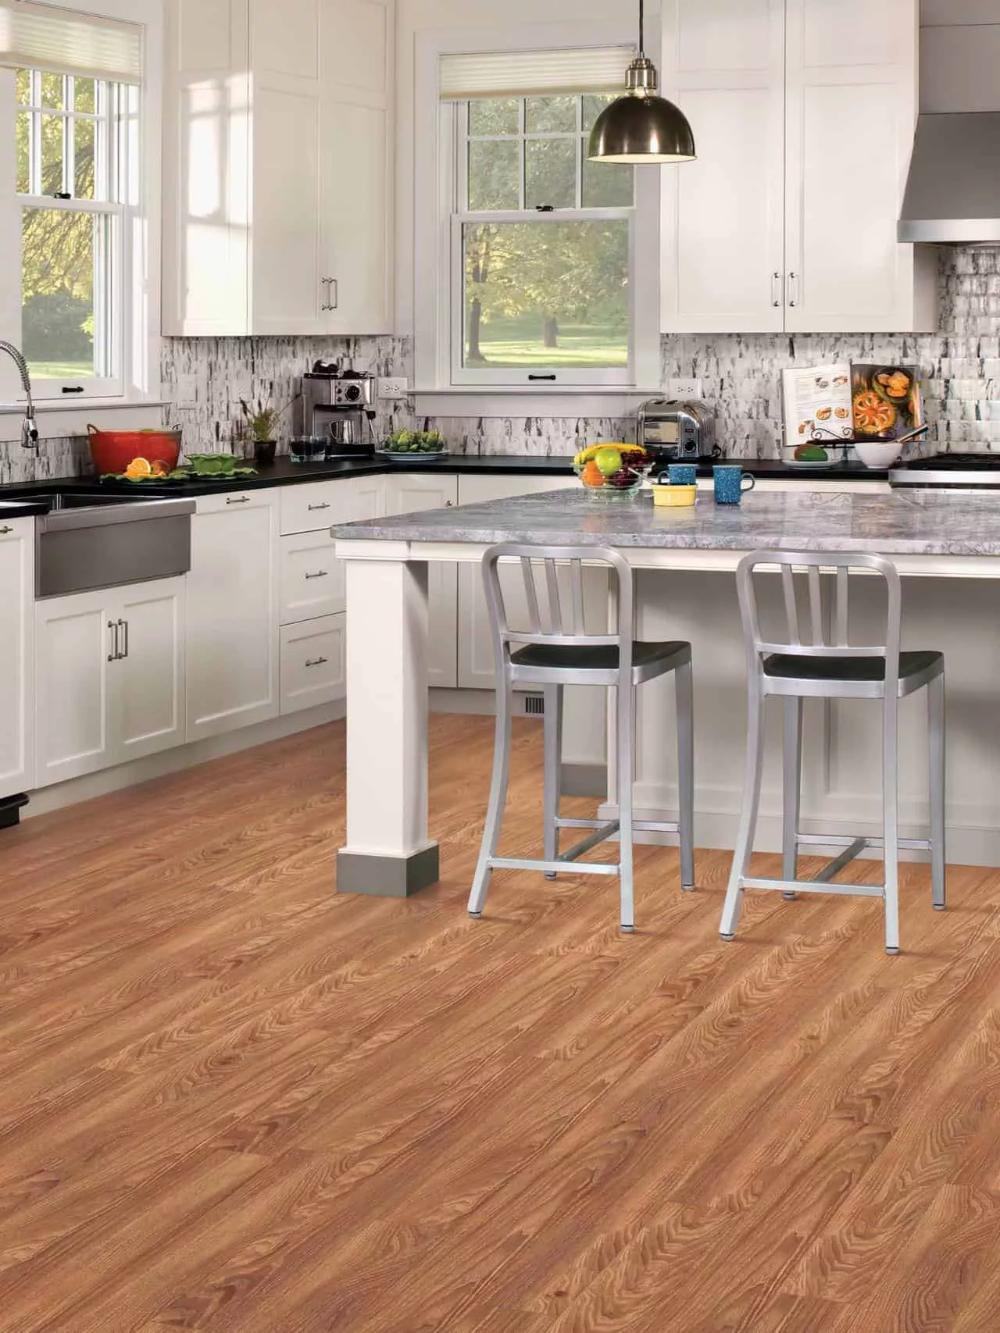 22 kitchen flooring options and ideas pros cons in 2020 kitchen flooring vinyl flooring on kitchen remodel vinyl flooring id=37834